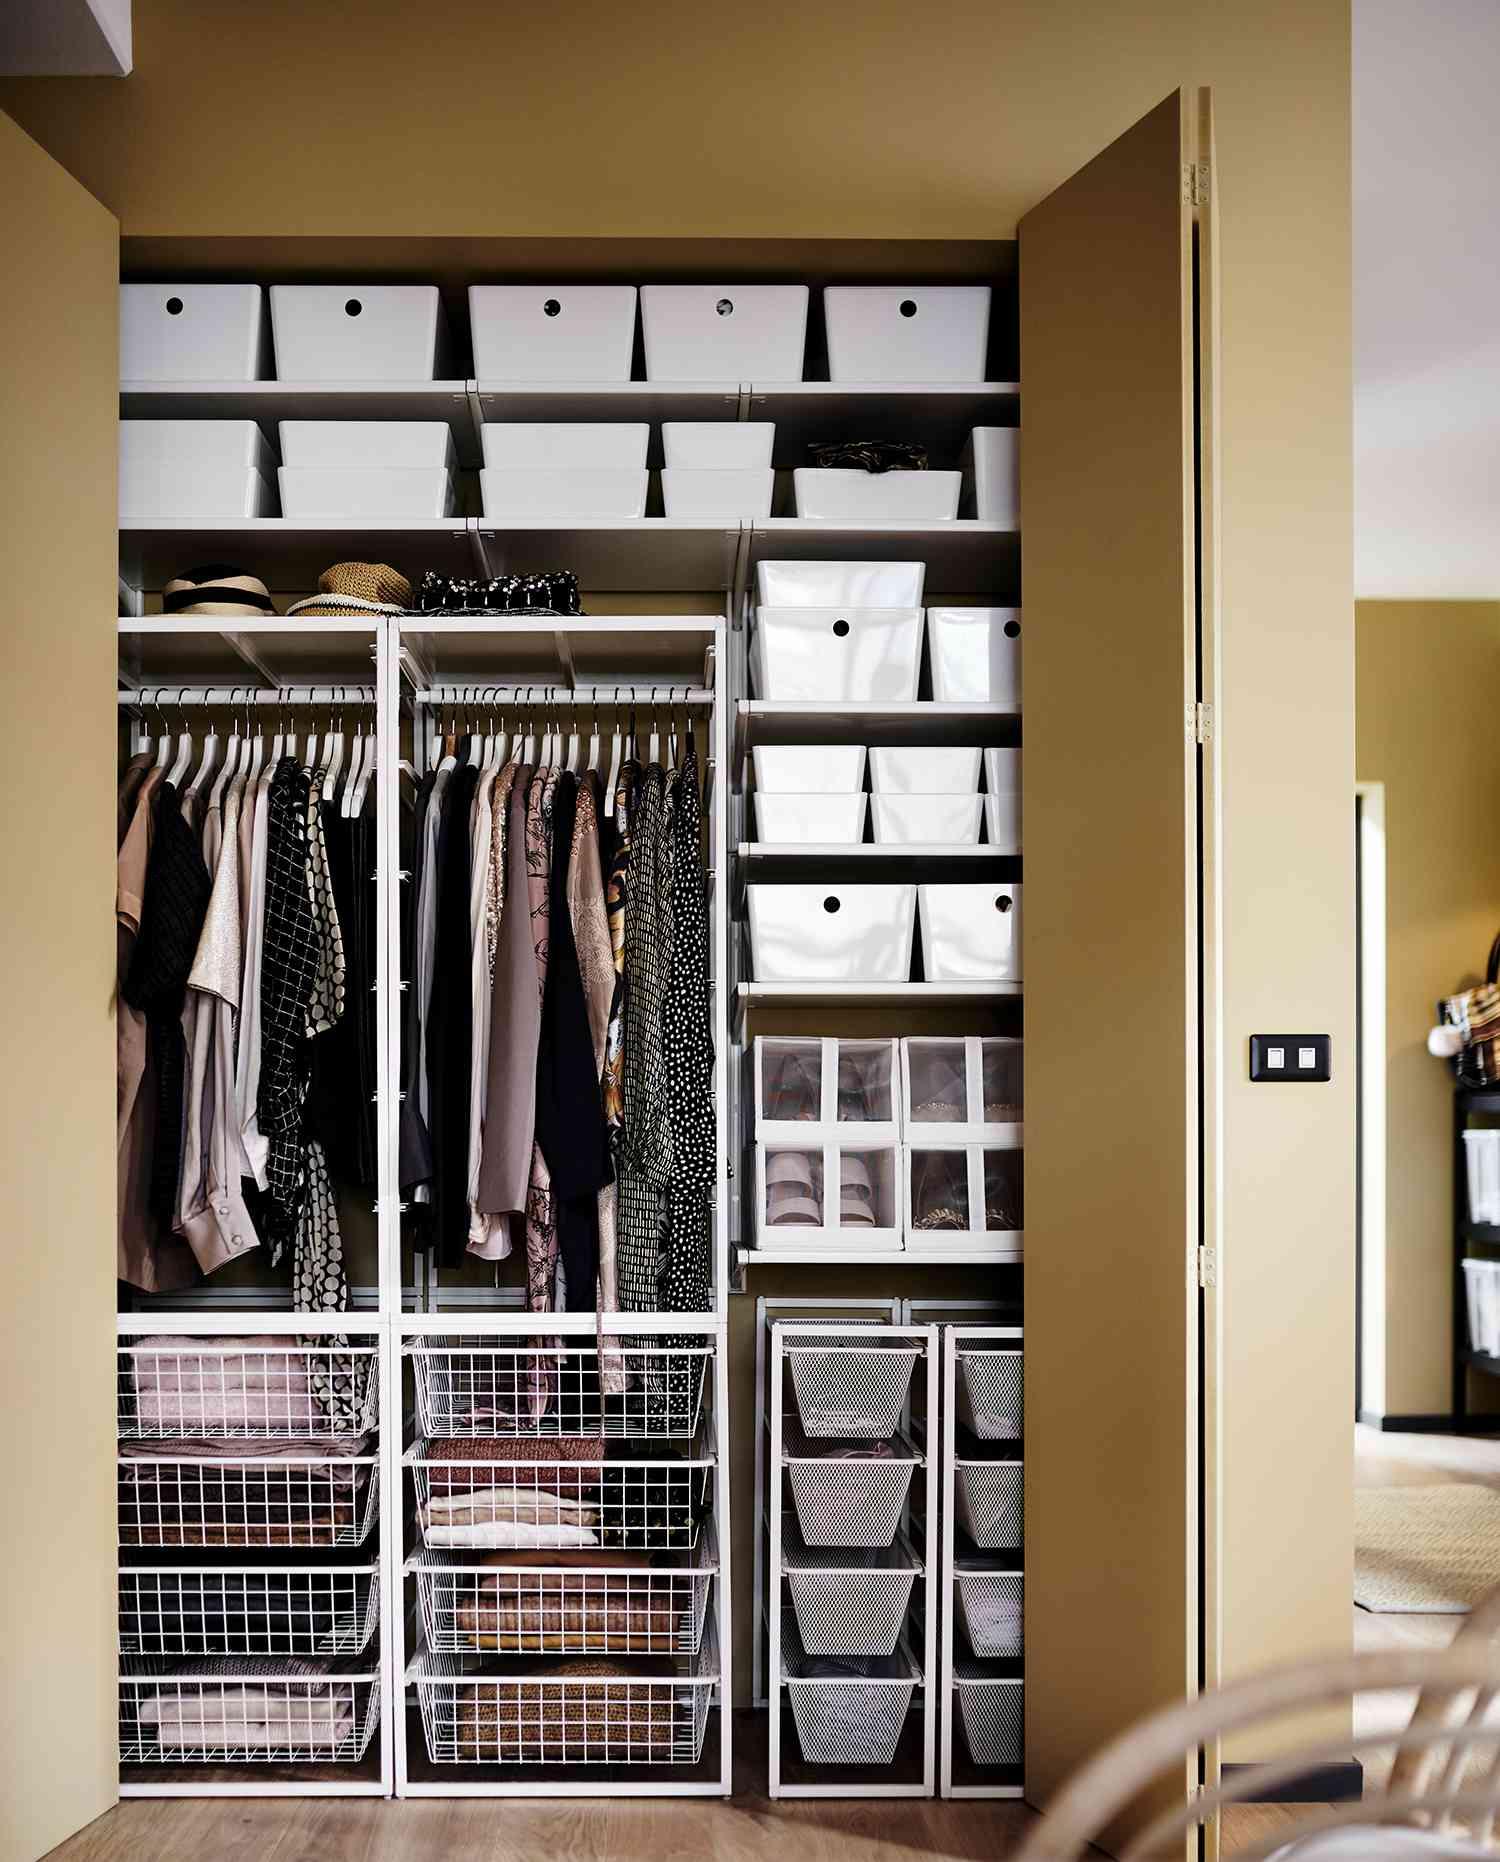 Closet with mesh storage built ins.